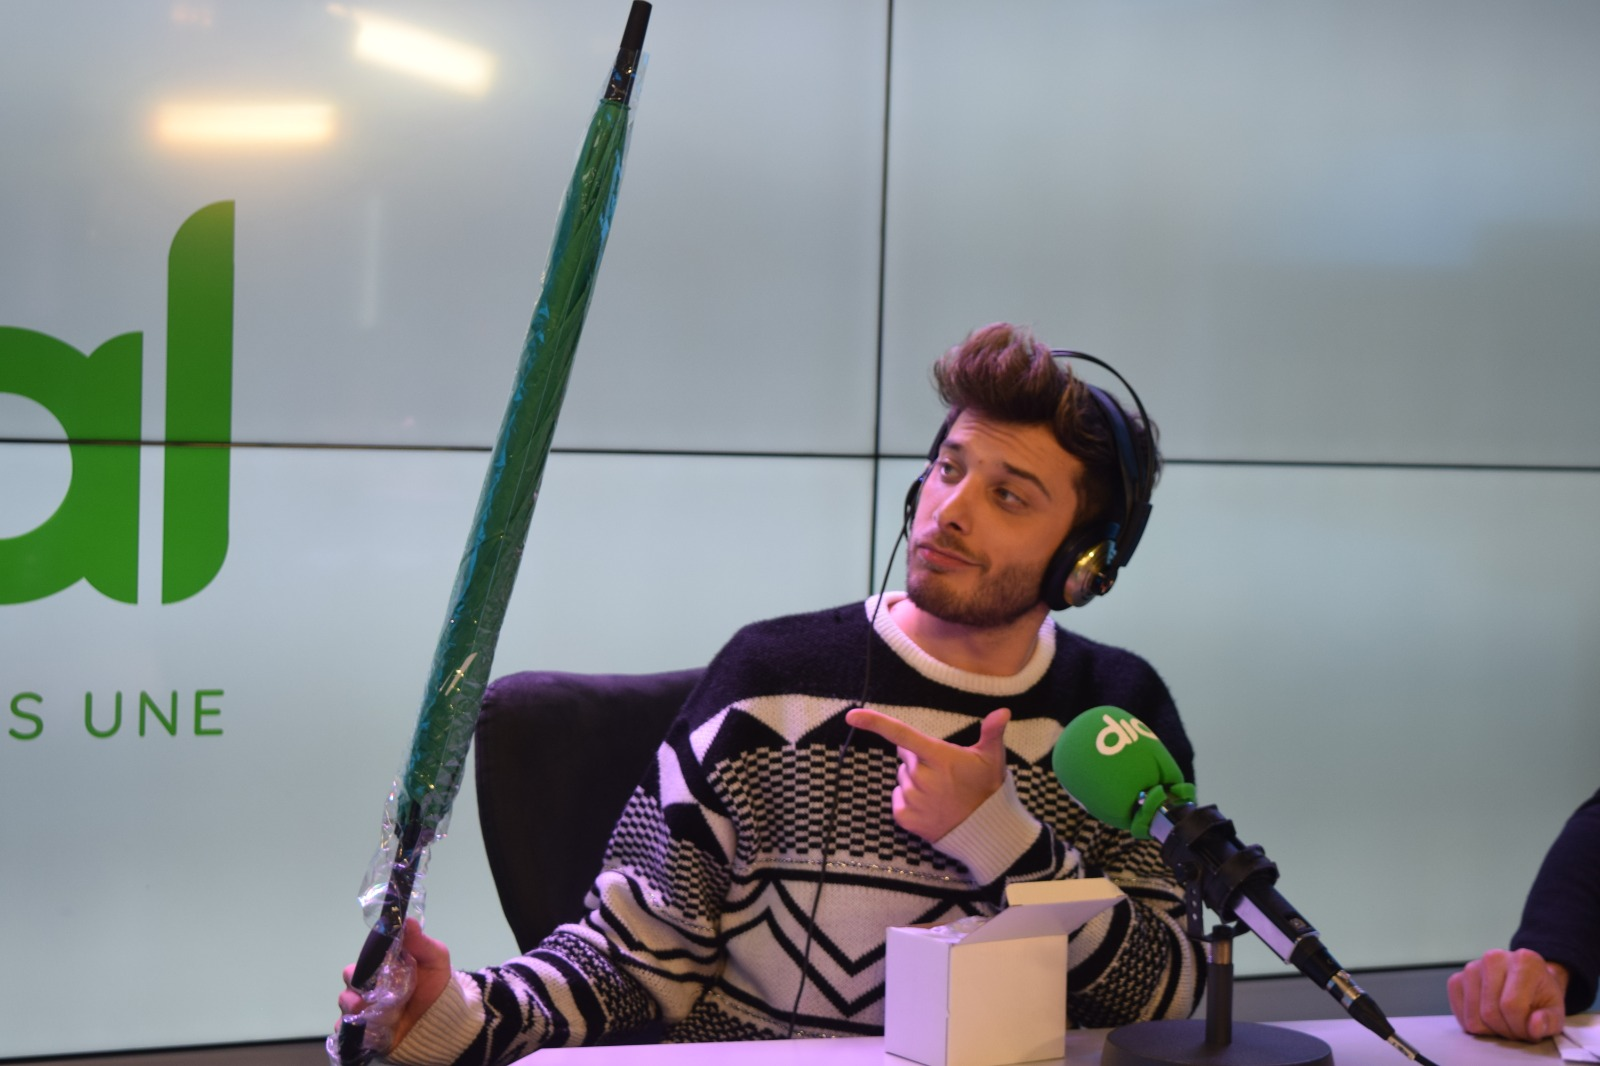 Blas Cantó recibe el paraguas de Atrévete